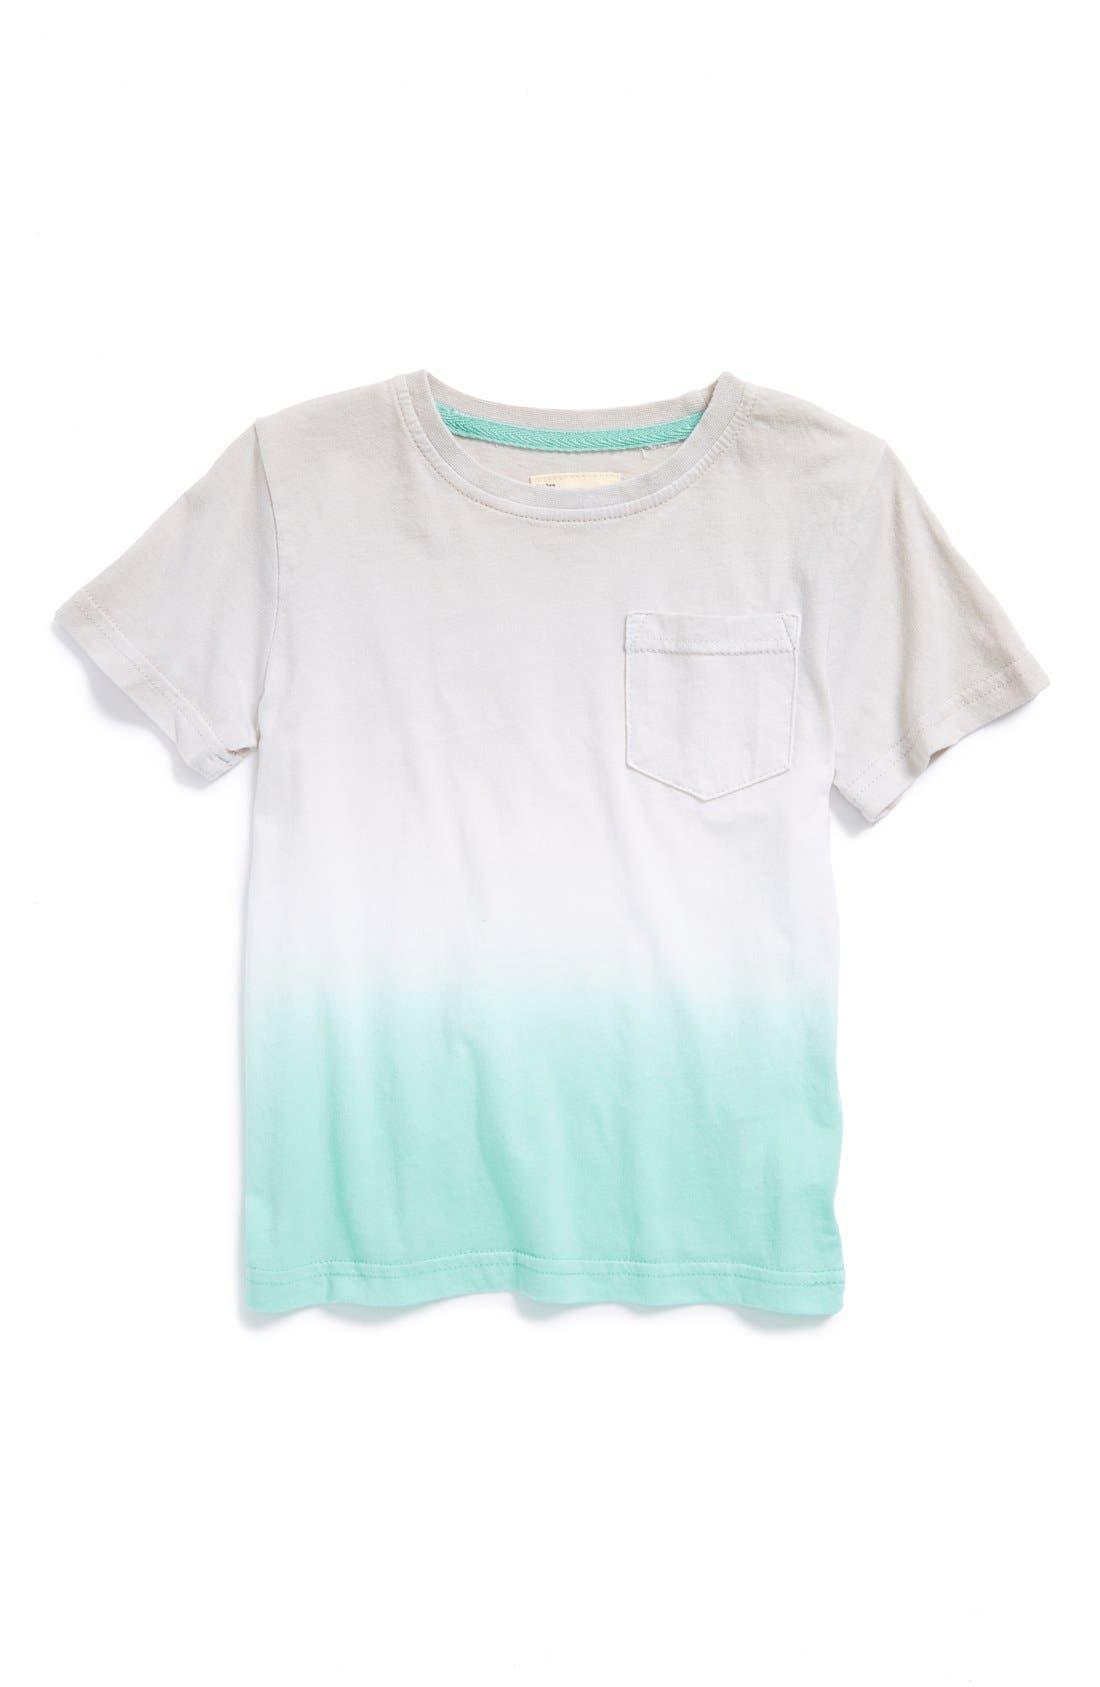 Main Image - Sovereign Code 'Triple Dip' Short Sleeve Shirt (Toddler Boys)